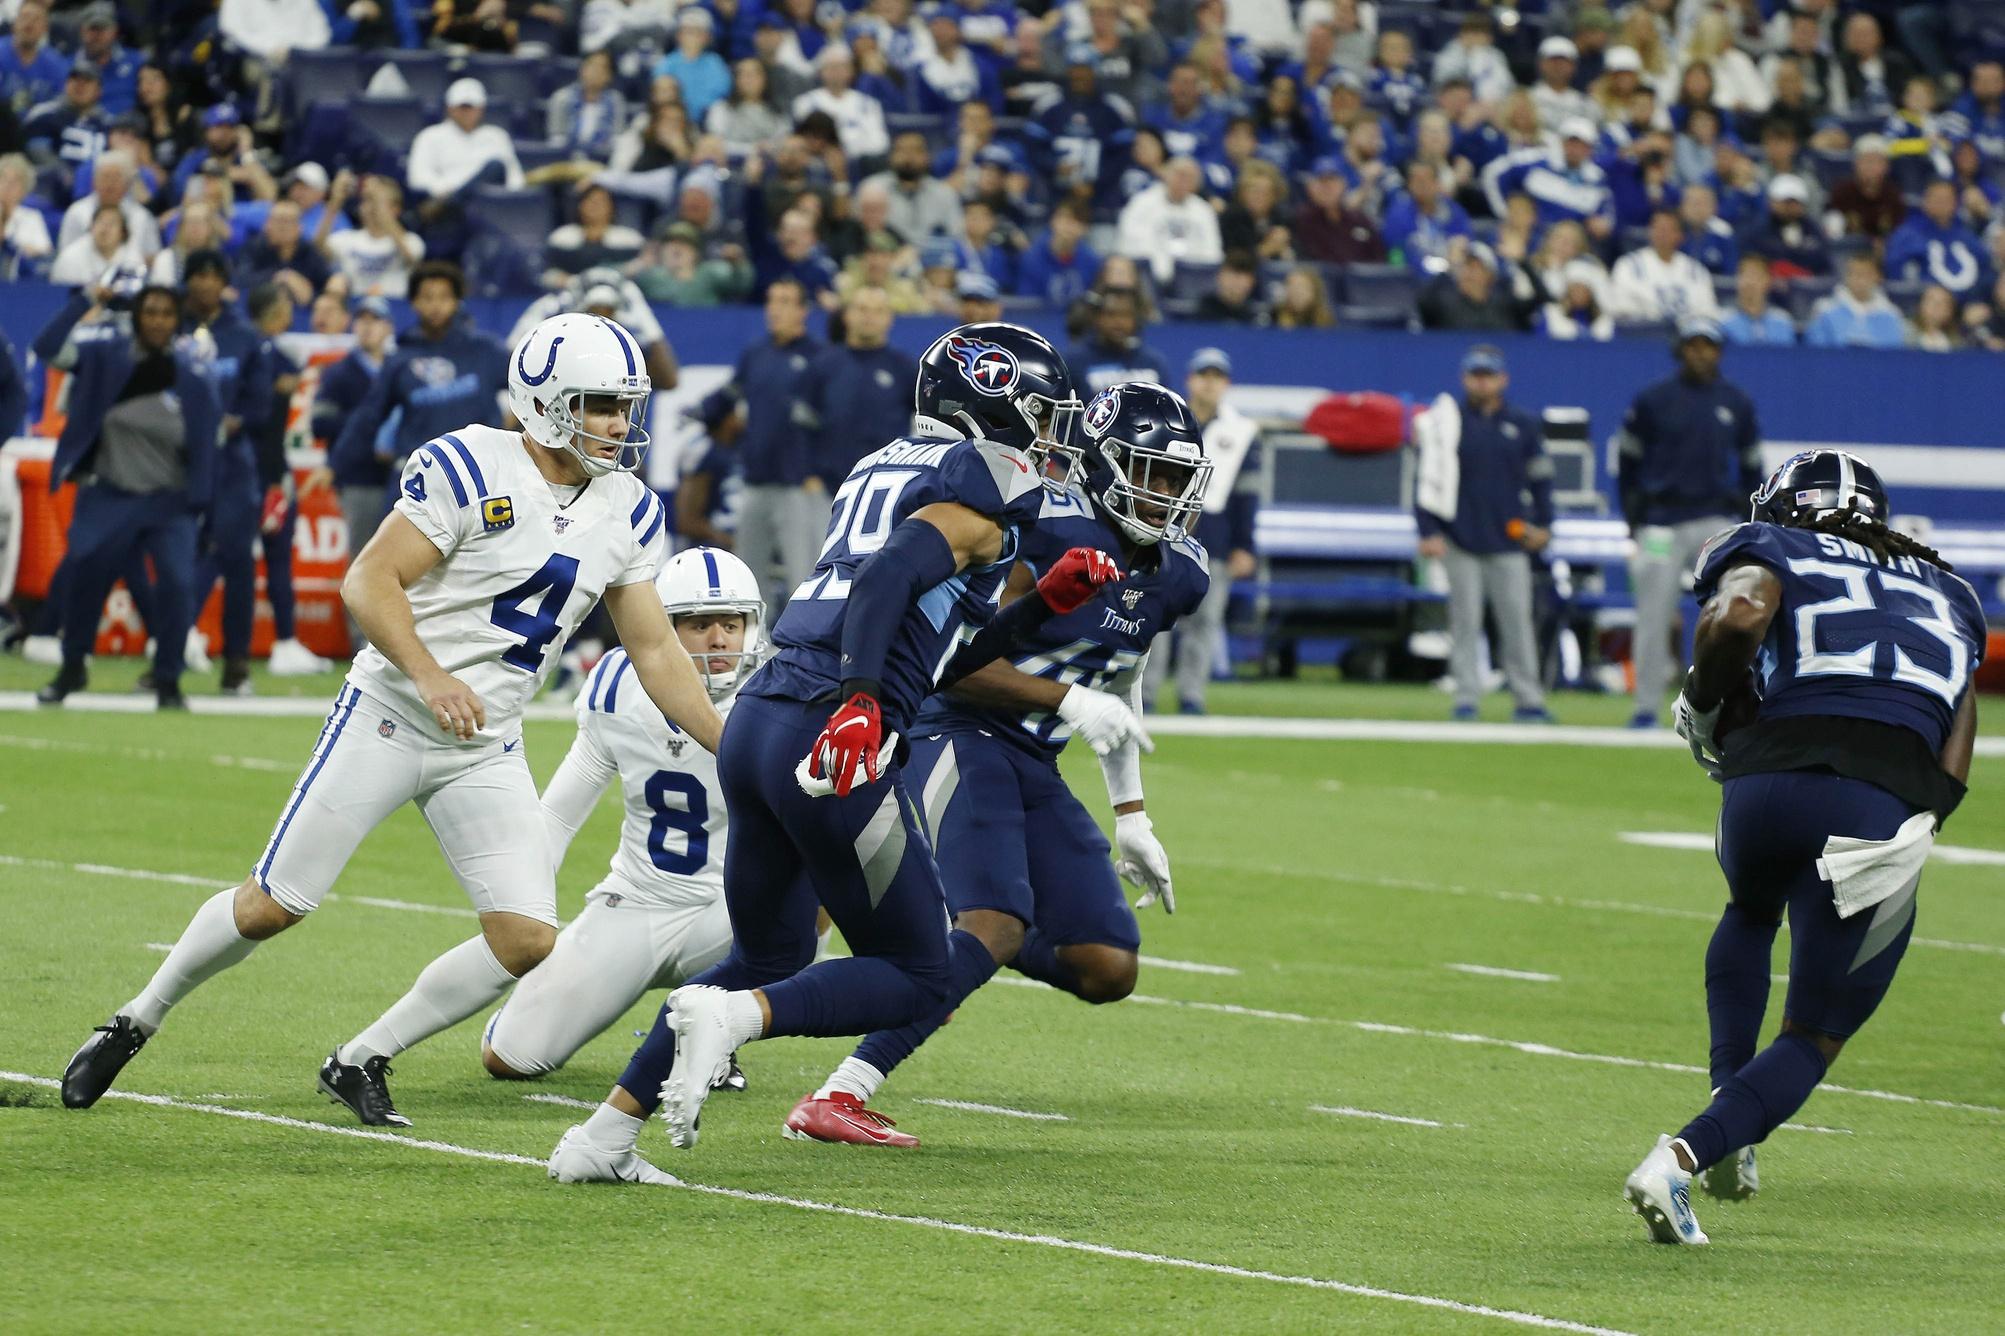 Blocked Kick Sends Surging Titans Past Colts